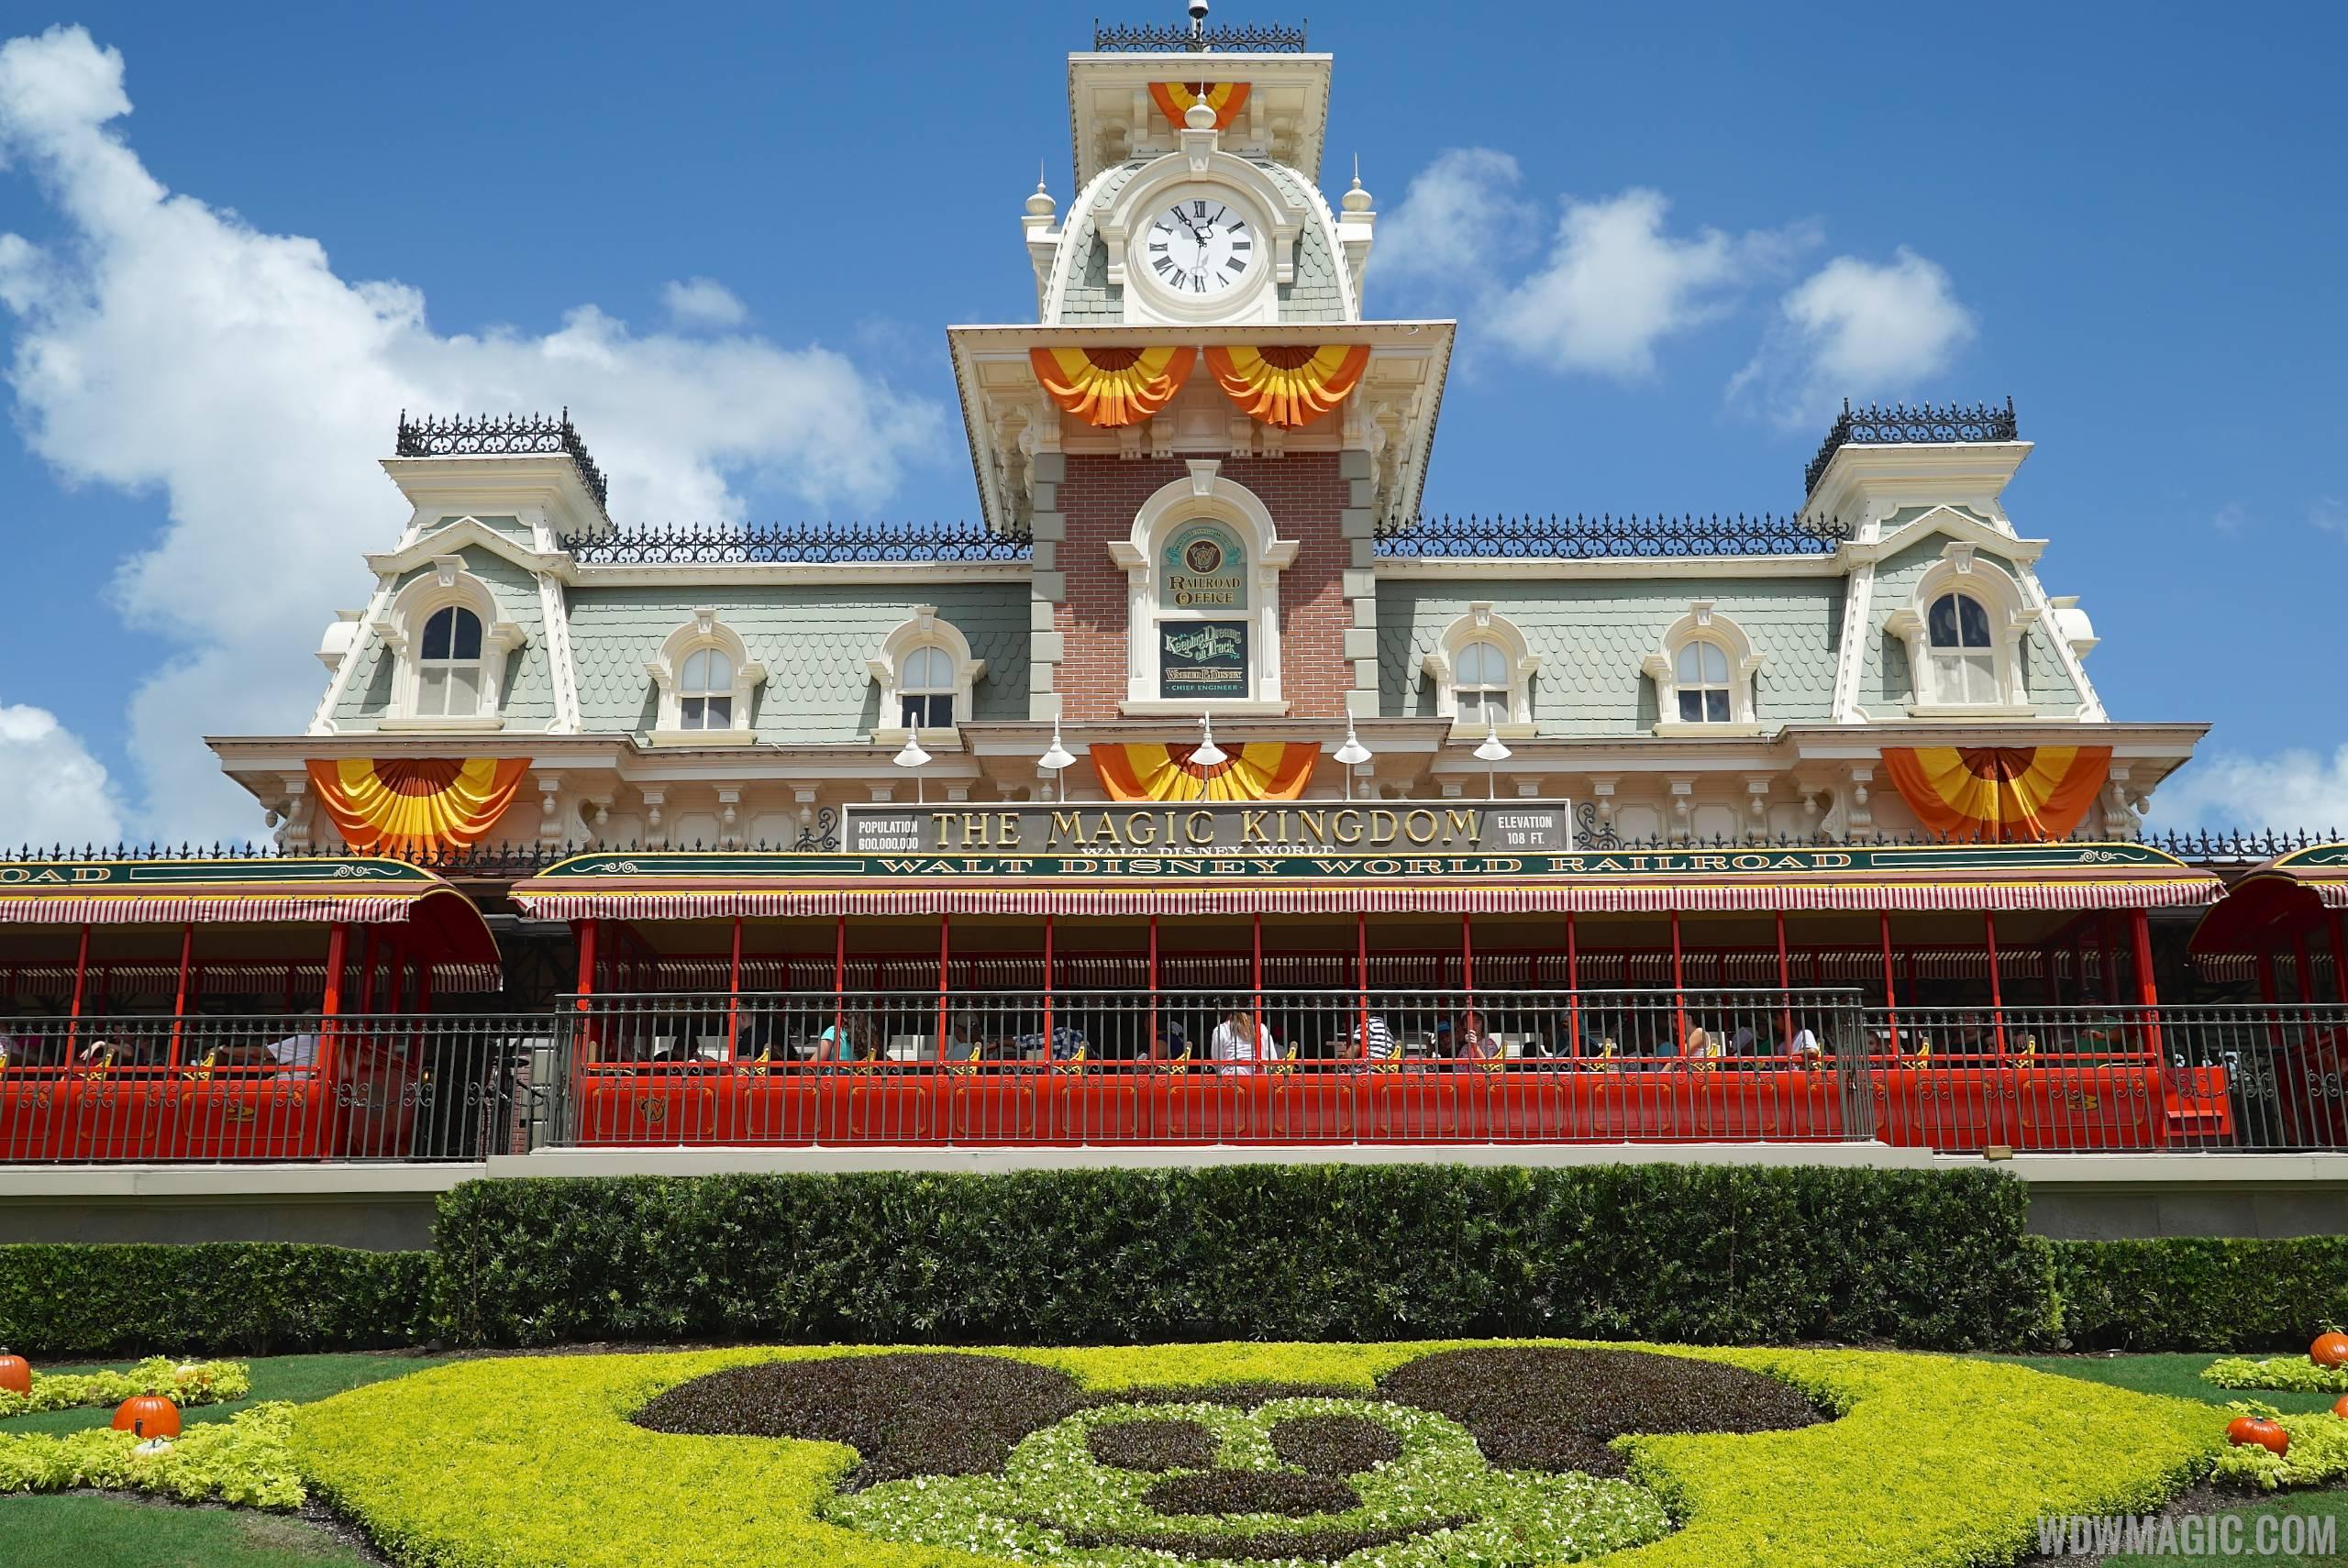 magic kingdoms fall halloween decorations 2014 photo 37 of 37 - Disney World Halloween Decorations